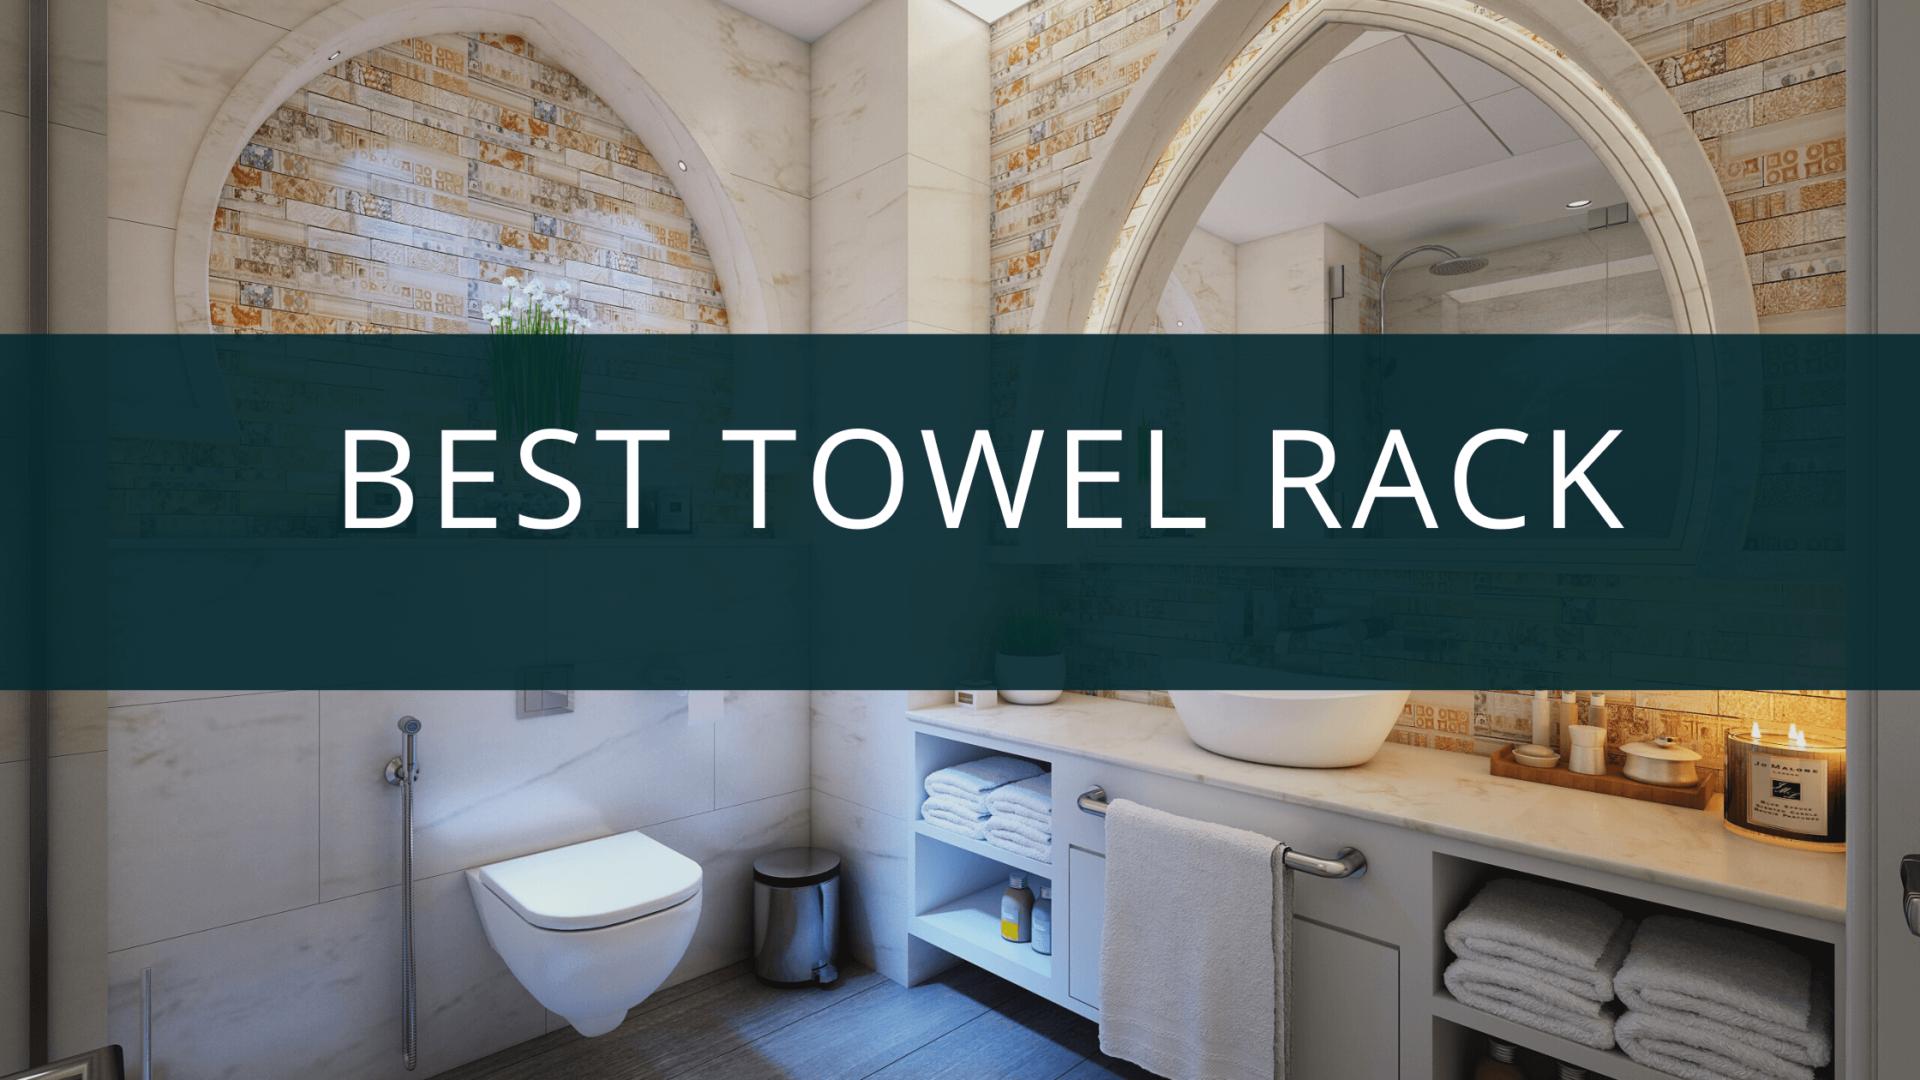 18 Best Towel Rack for Bathroom in India 2020